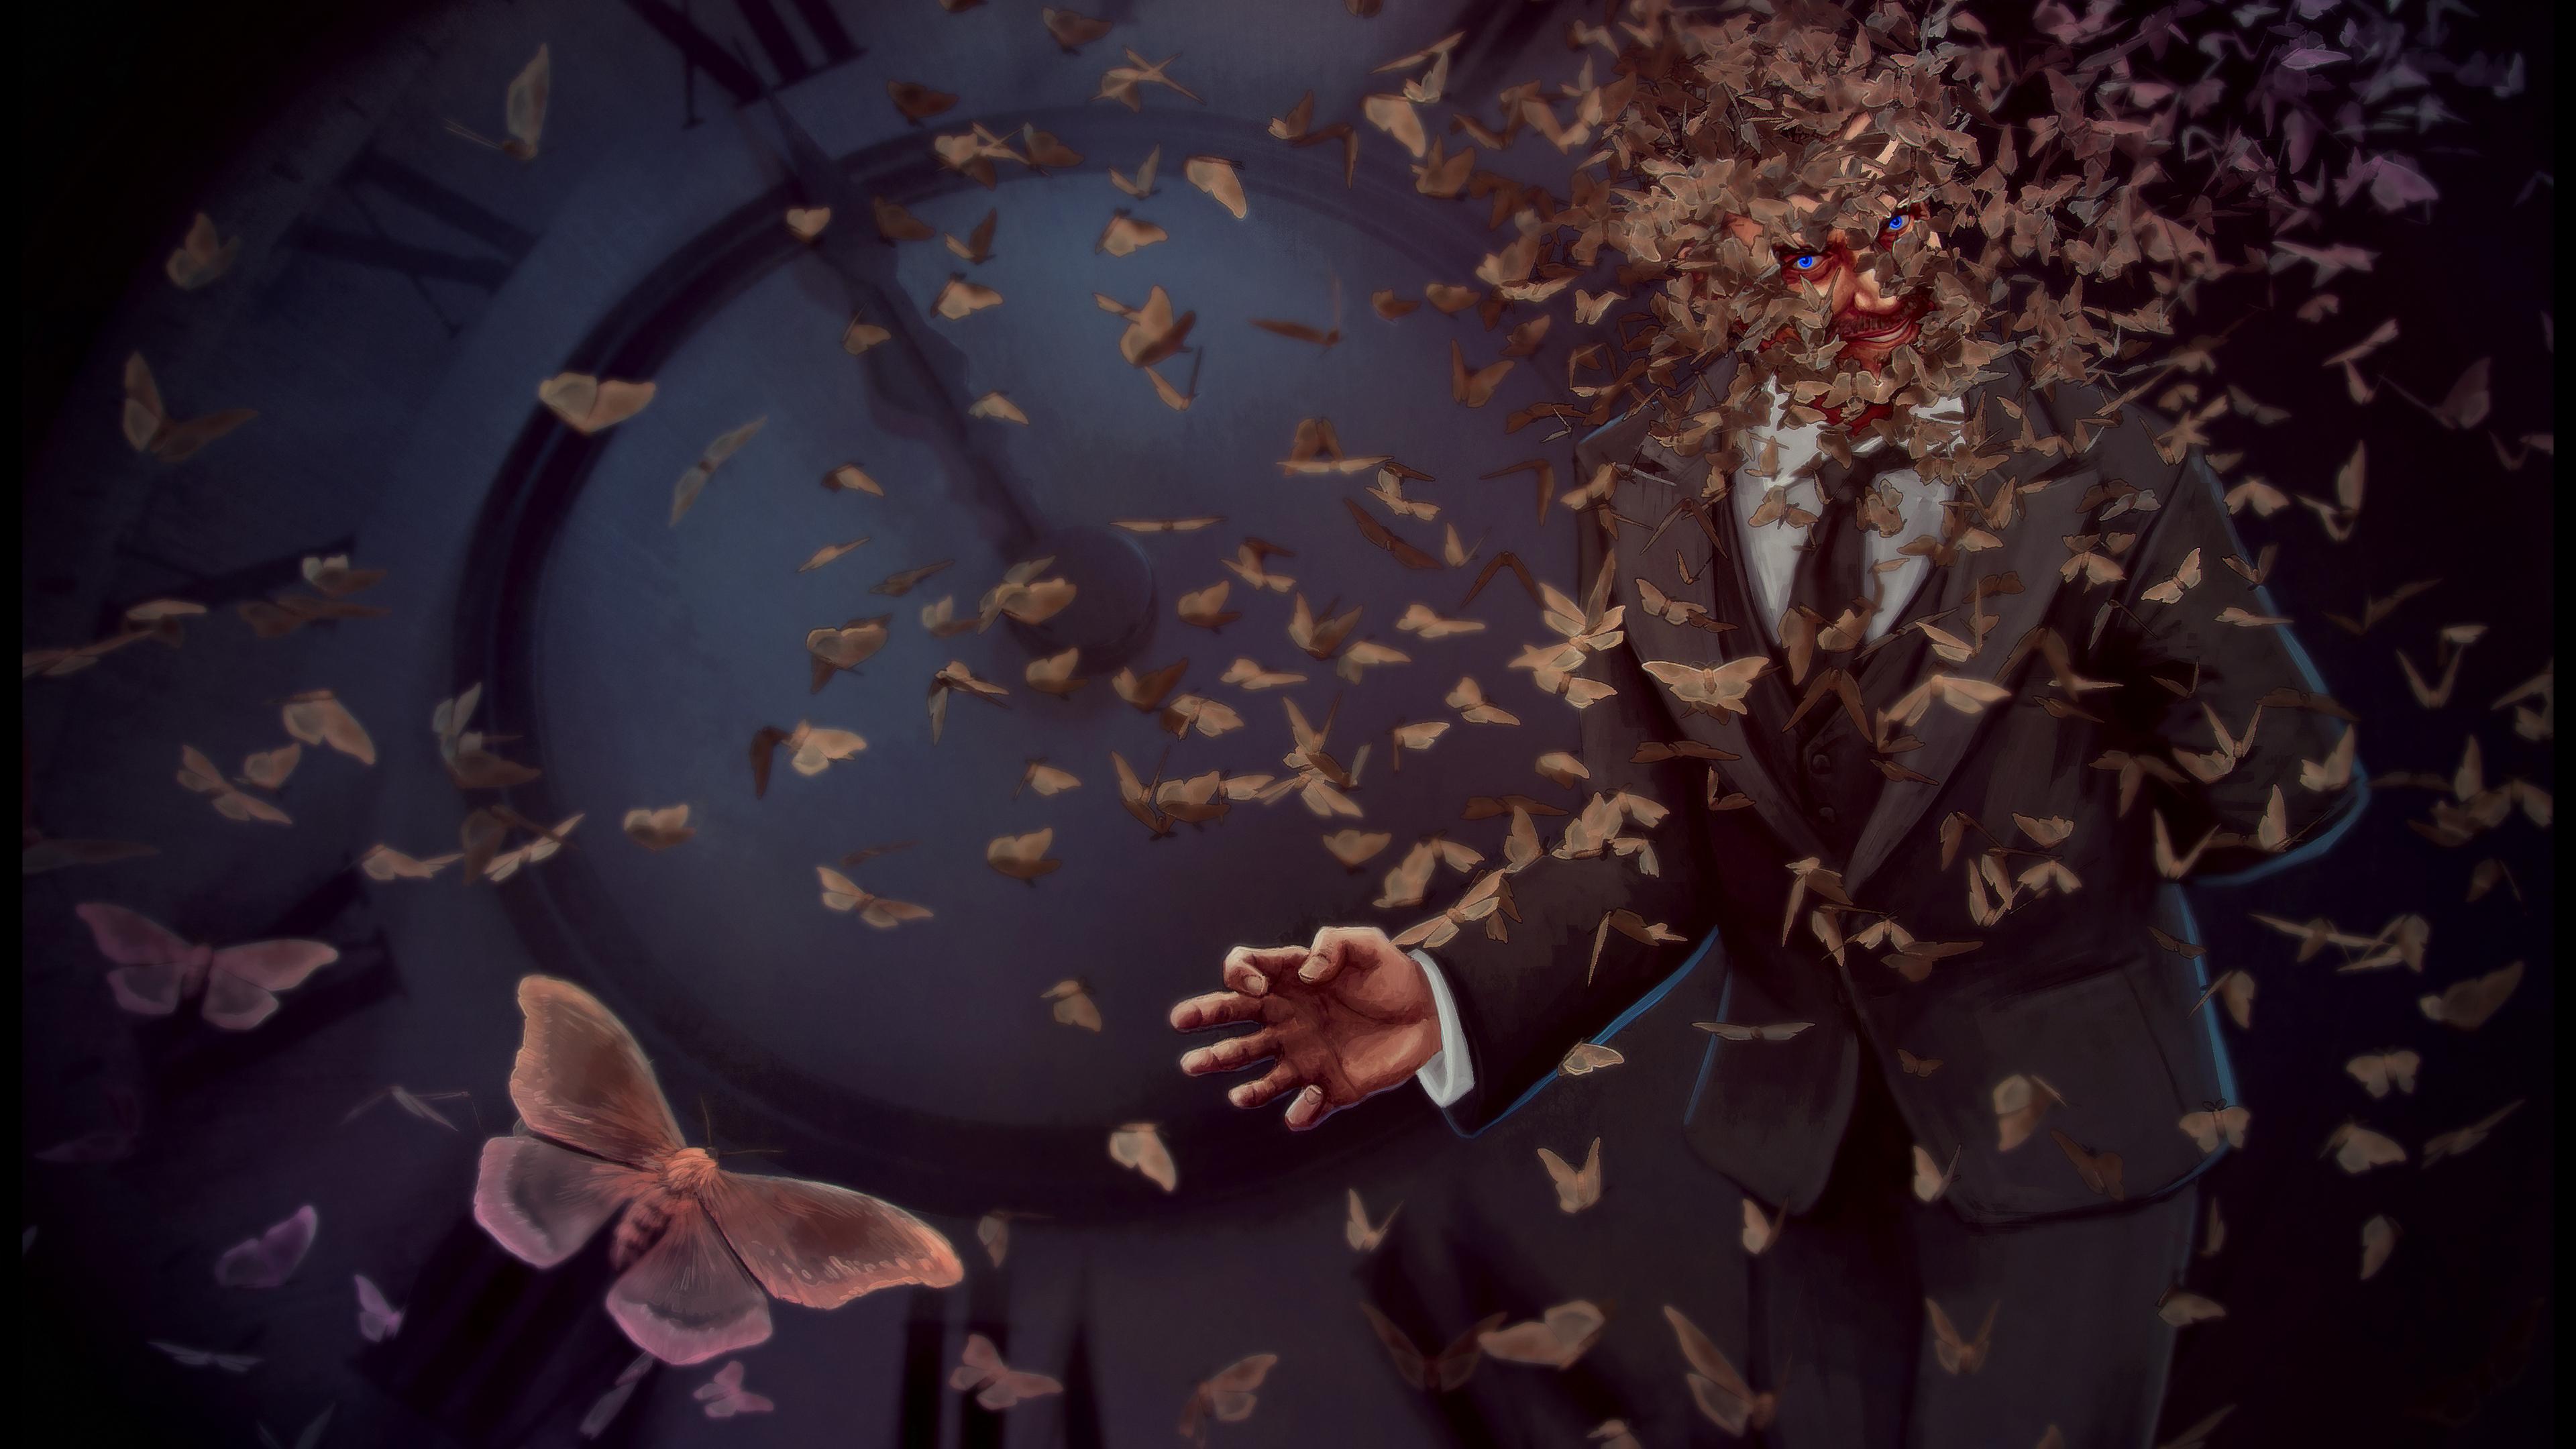 magician fantasy beast evil 4k 1551642526 - Magician Fantasy Beast Evil 4k - hd-wallpapers, fantasy wallpapers, evil wallpapers, digital art wallpapers, deviantart wallpapers, artwork wallpapers, artist wallpapers, 5k wallpapers, 4k-wallpapers